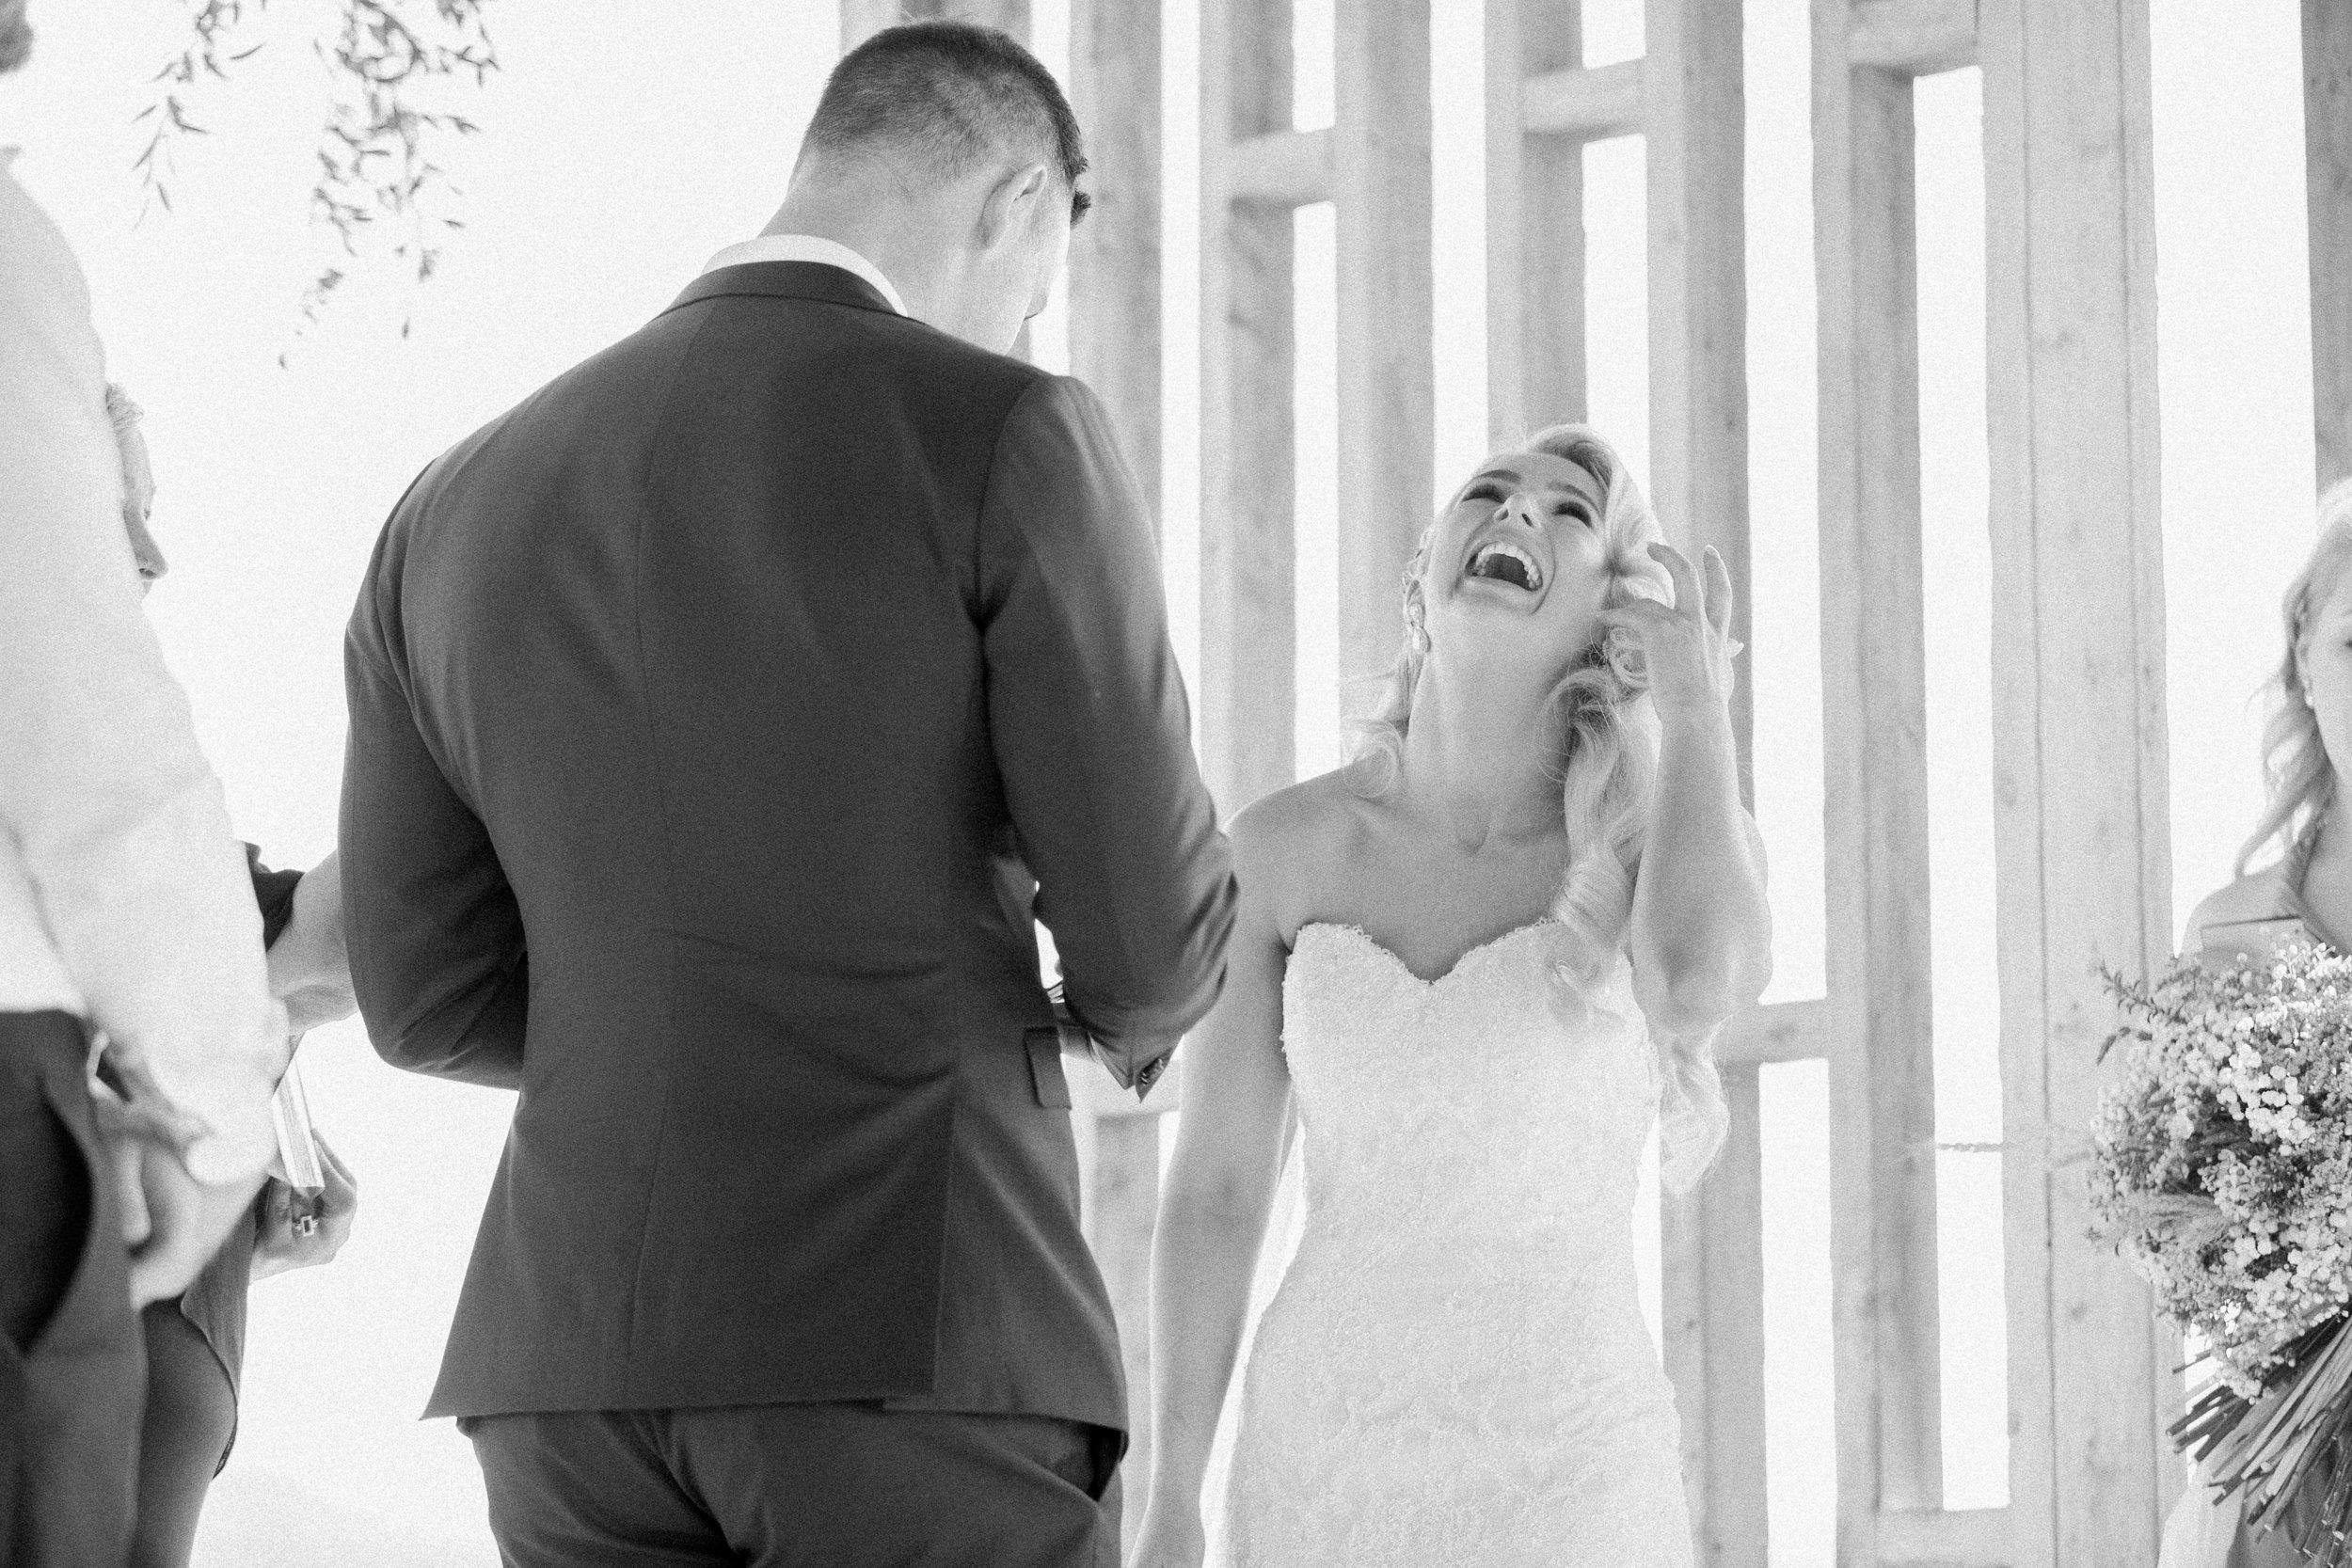 Kooroomba-Vineyard-Lavender-Farm-Wedding-Fine-Art-Lauren-Olivia-43.jpg